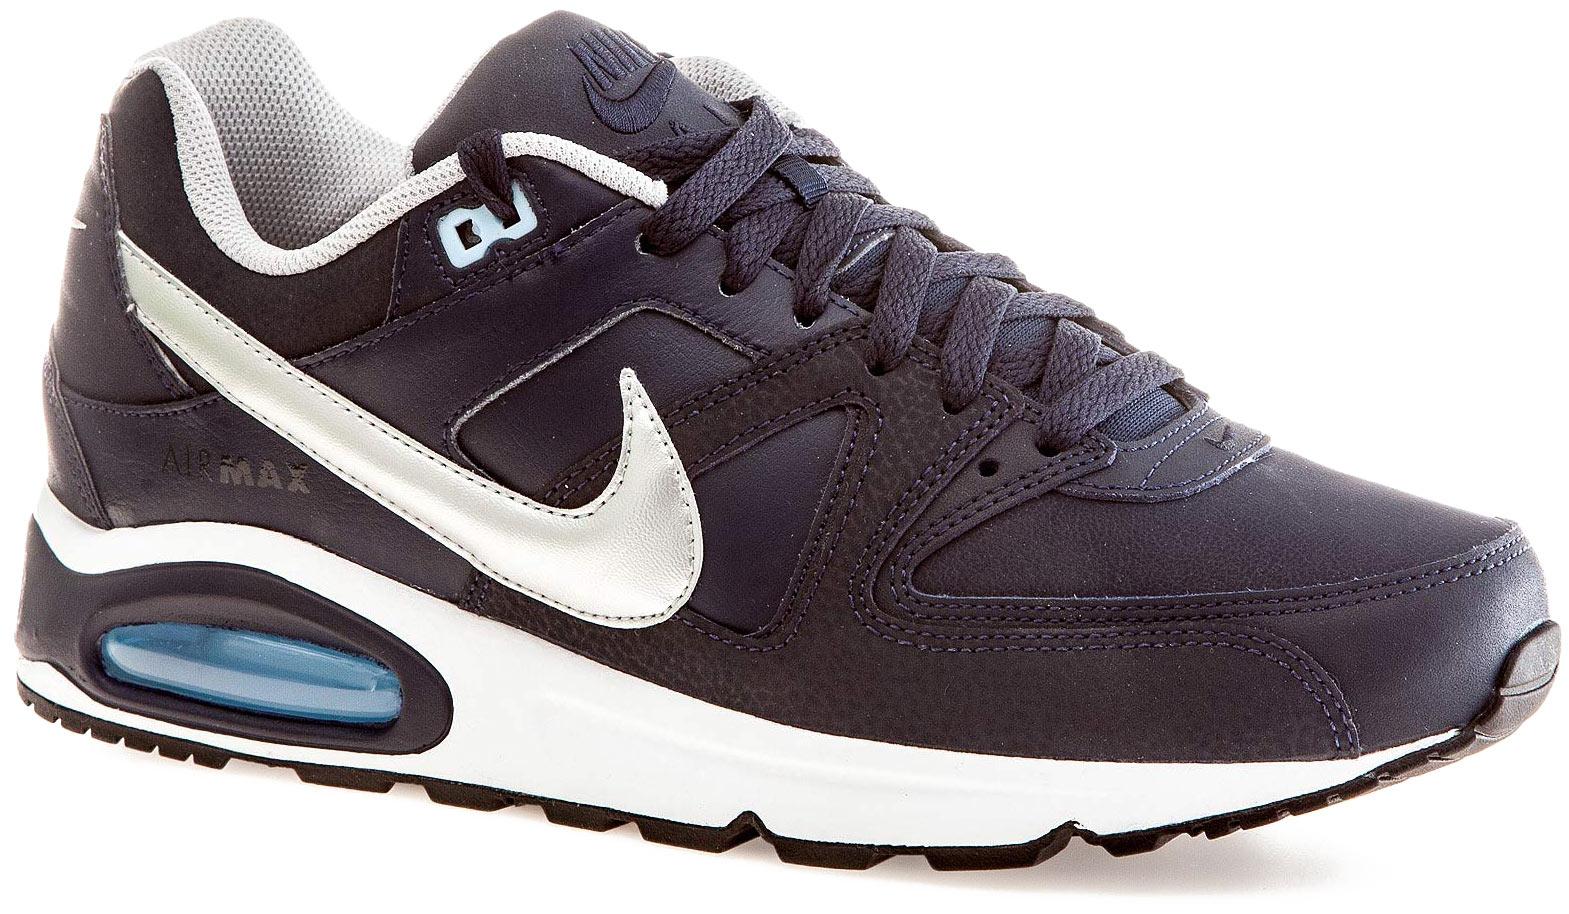 f8a3d3a27 Nike AIR MAX COMMAND LEATHER. Pánske lifestylové topánky